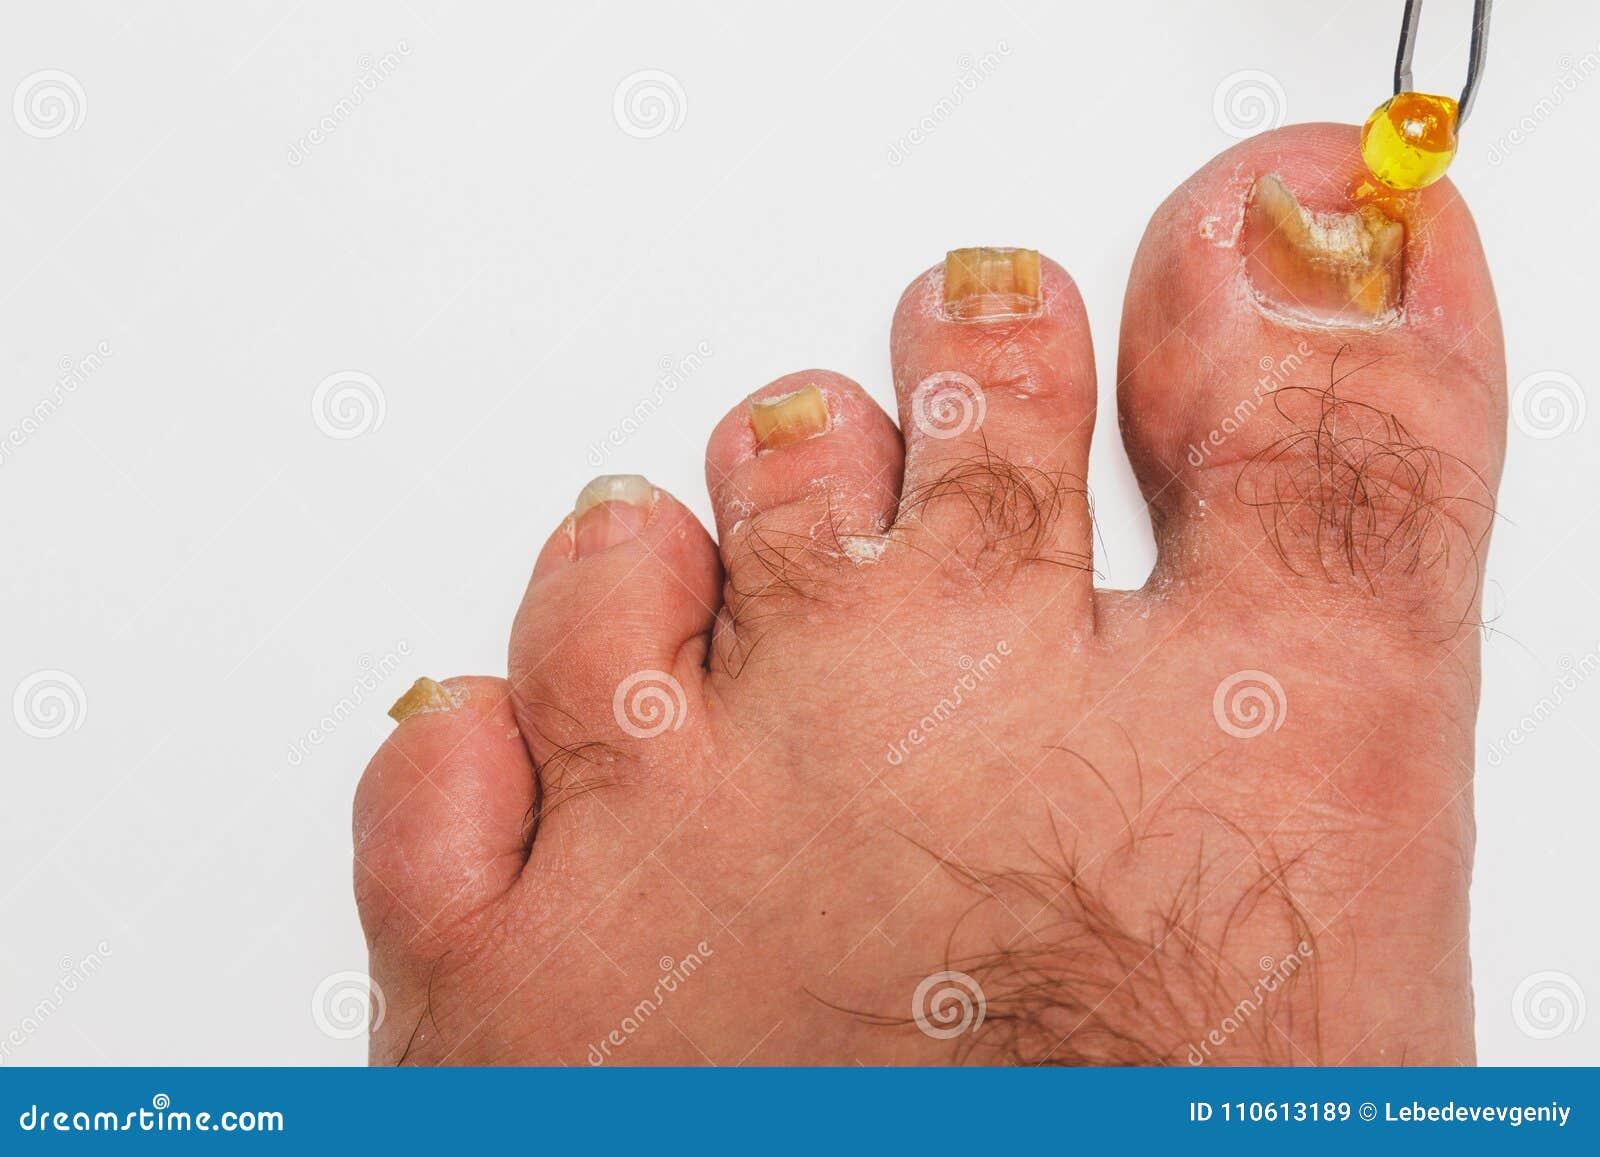 A toenail fungus stock image. Image of fungal, healthcare - 110613189